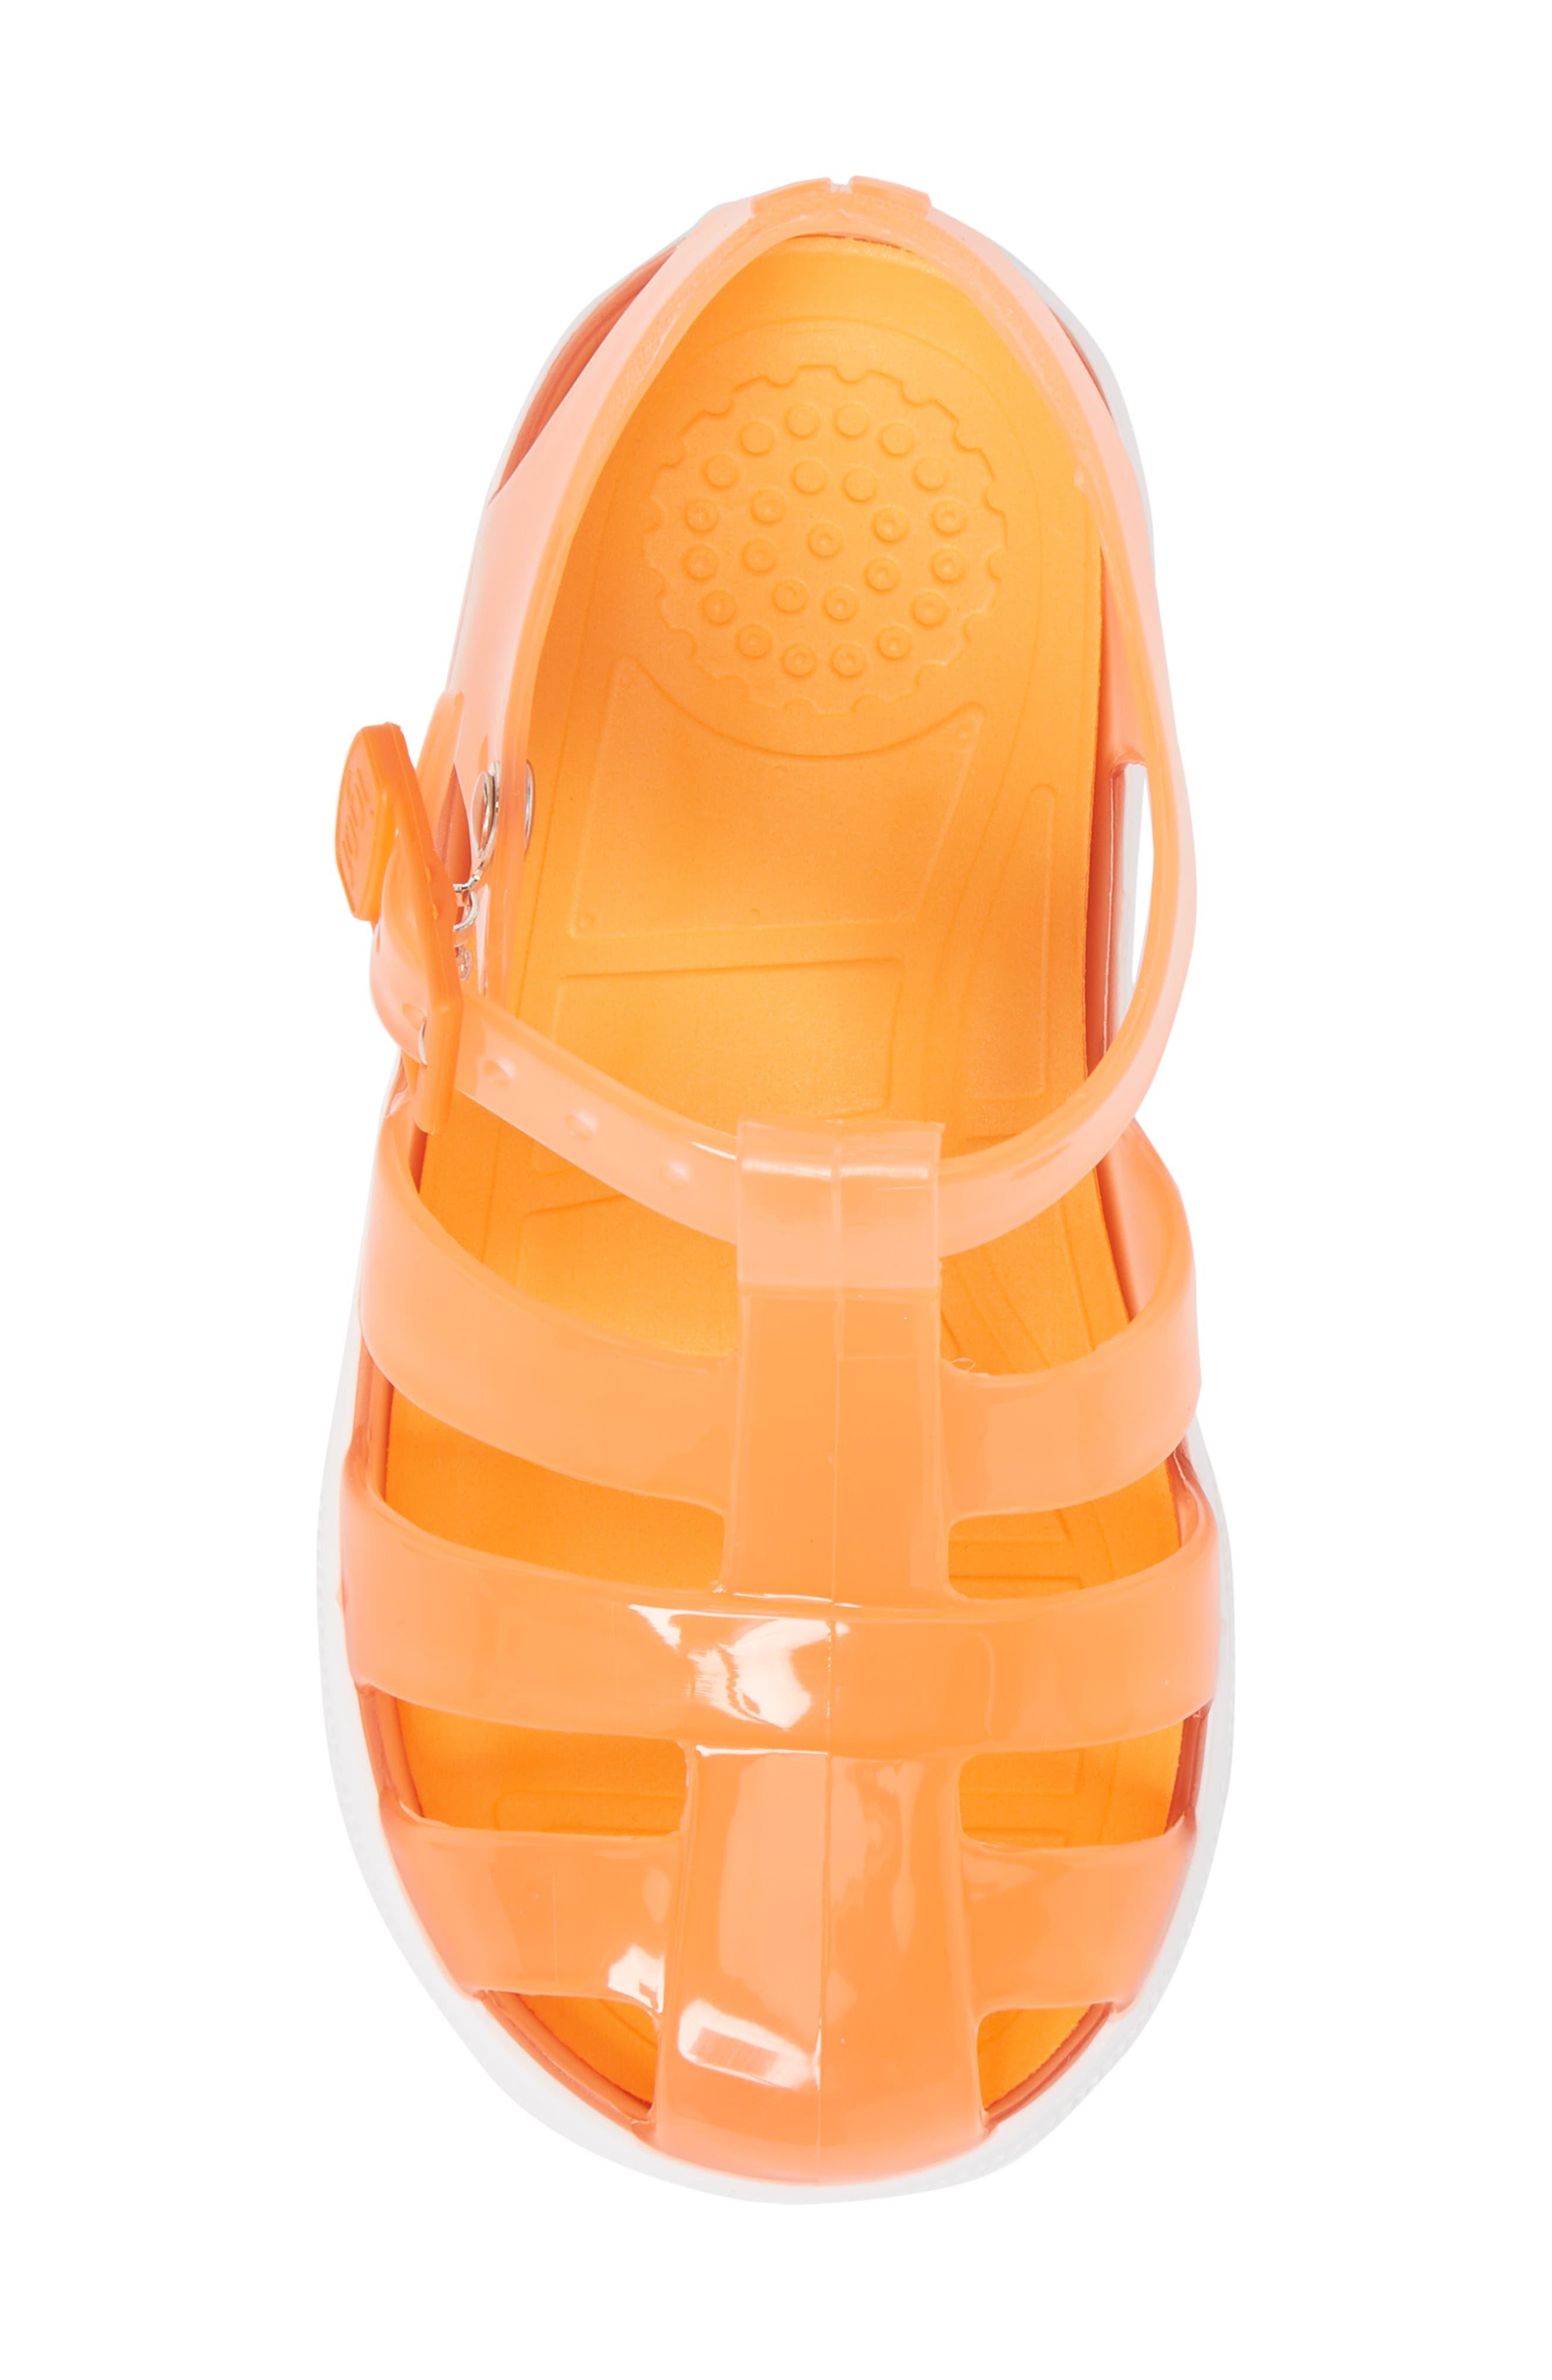 Tenis Fisherman Jelly Sandal,                             Alternate thumbnail 5, color,                             Crystal Neon Orange